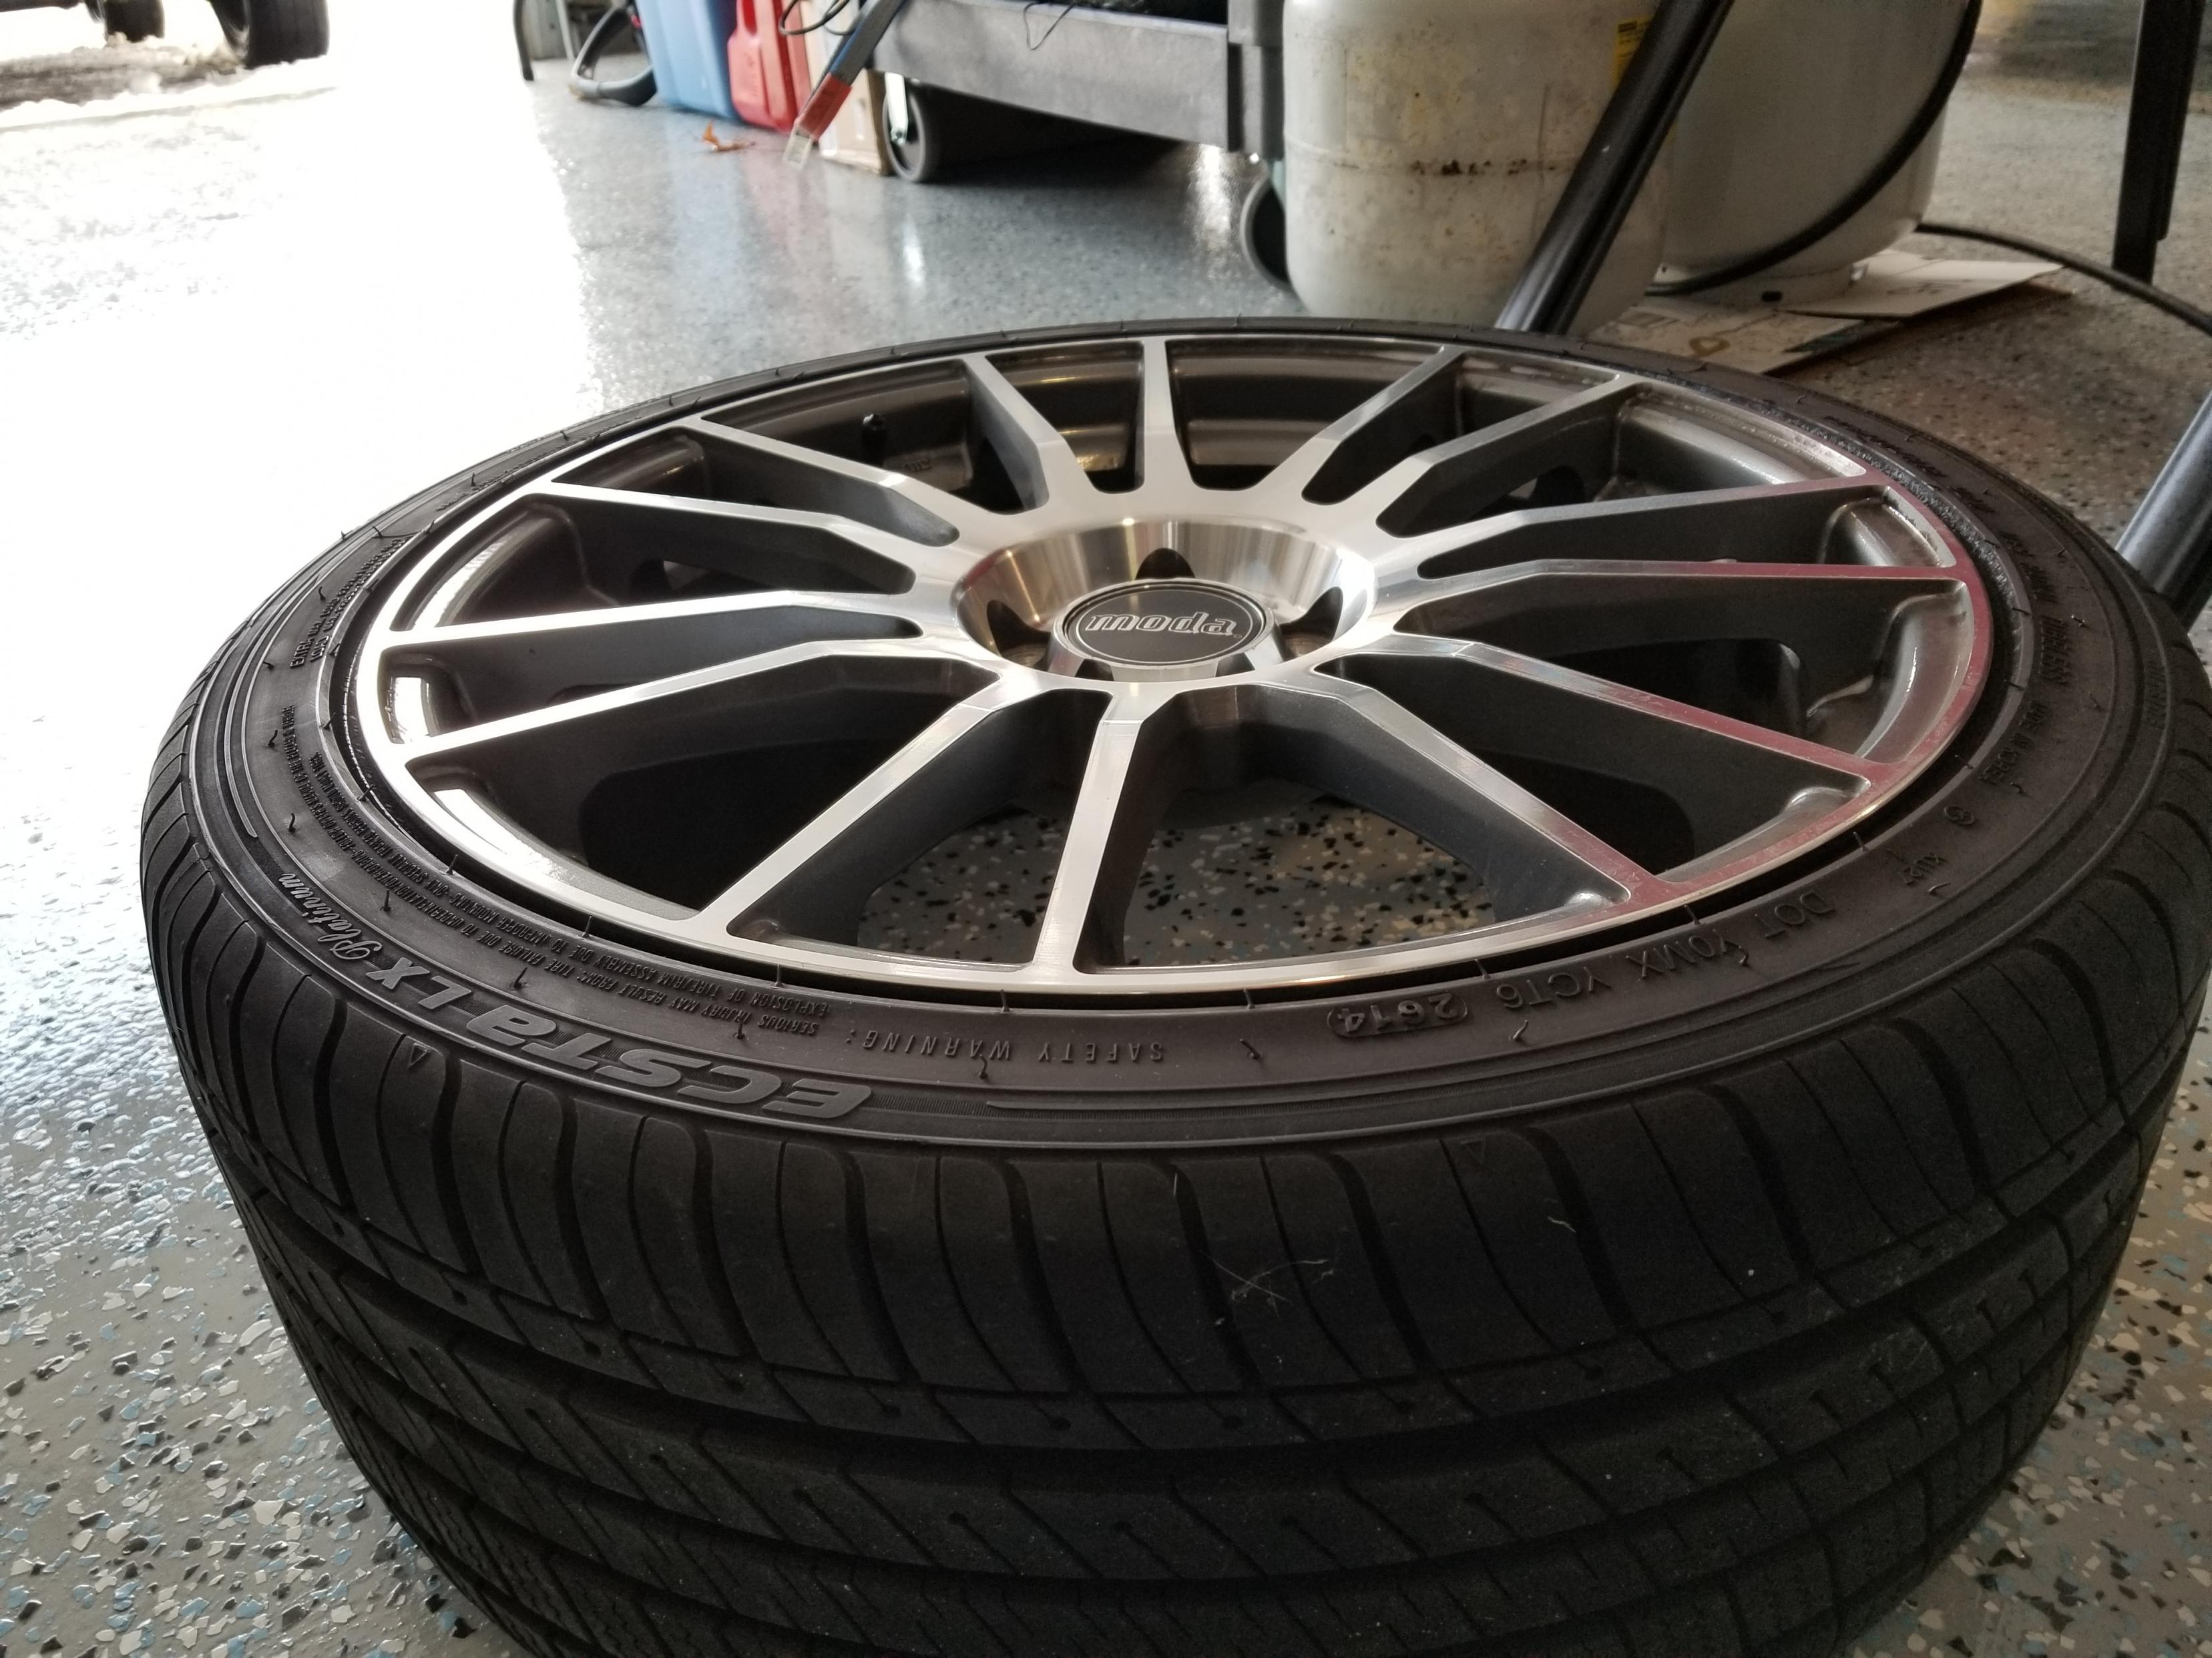 Moda MD20 18x8 with Kumo tires (like new).-20190213_135214-jpg